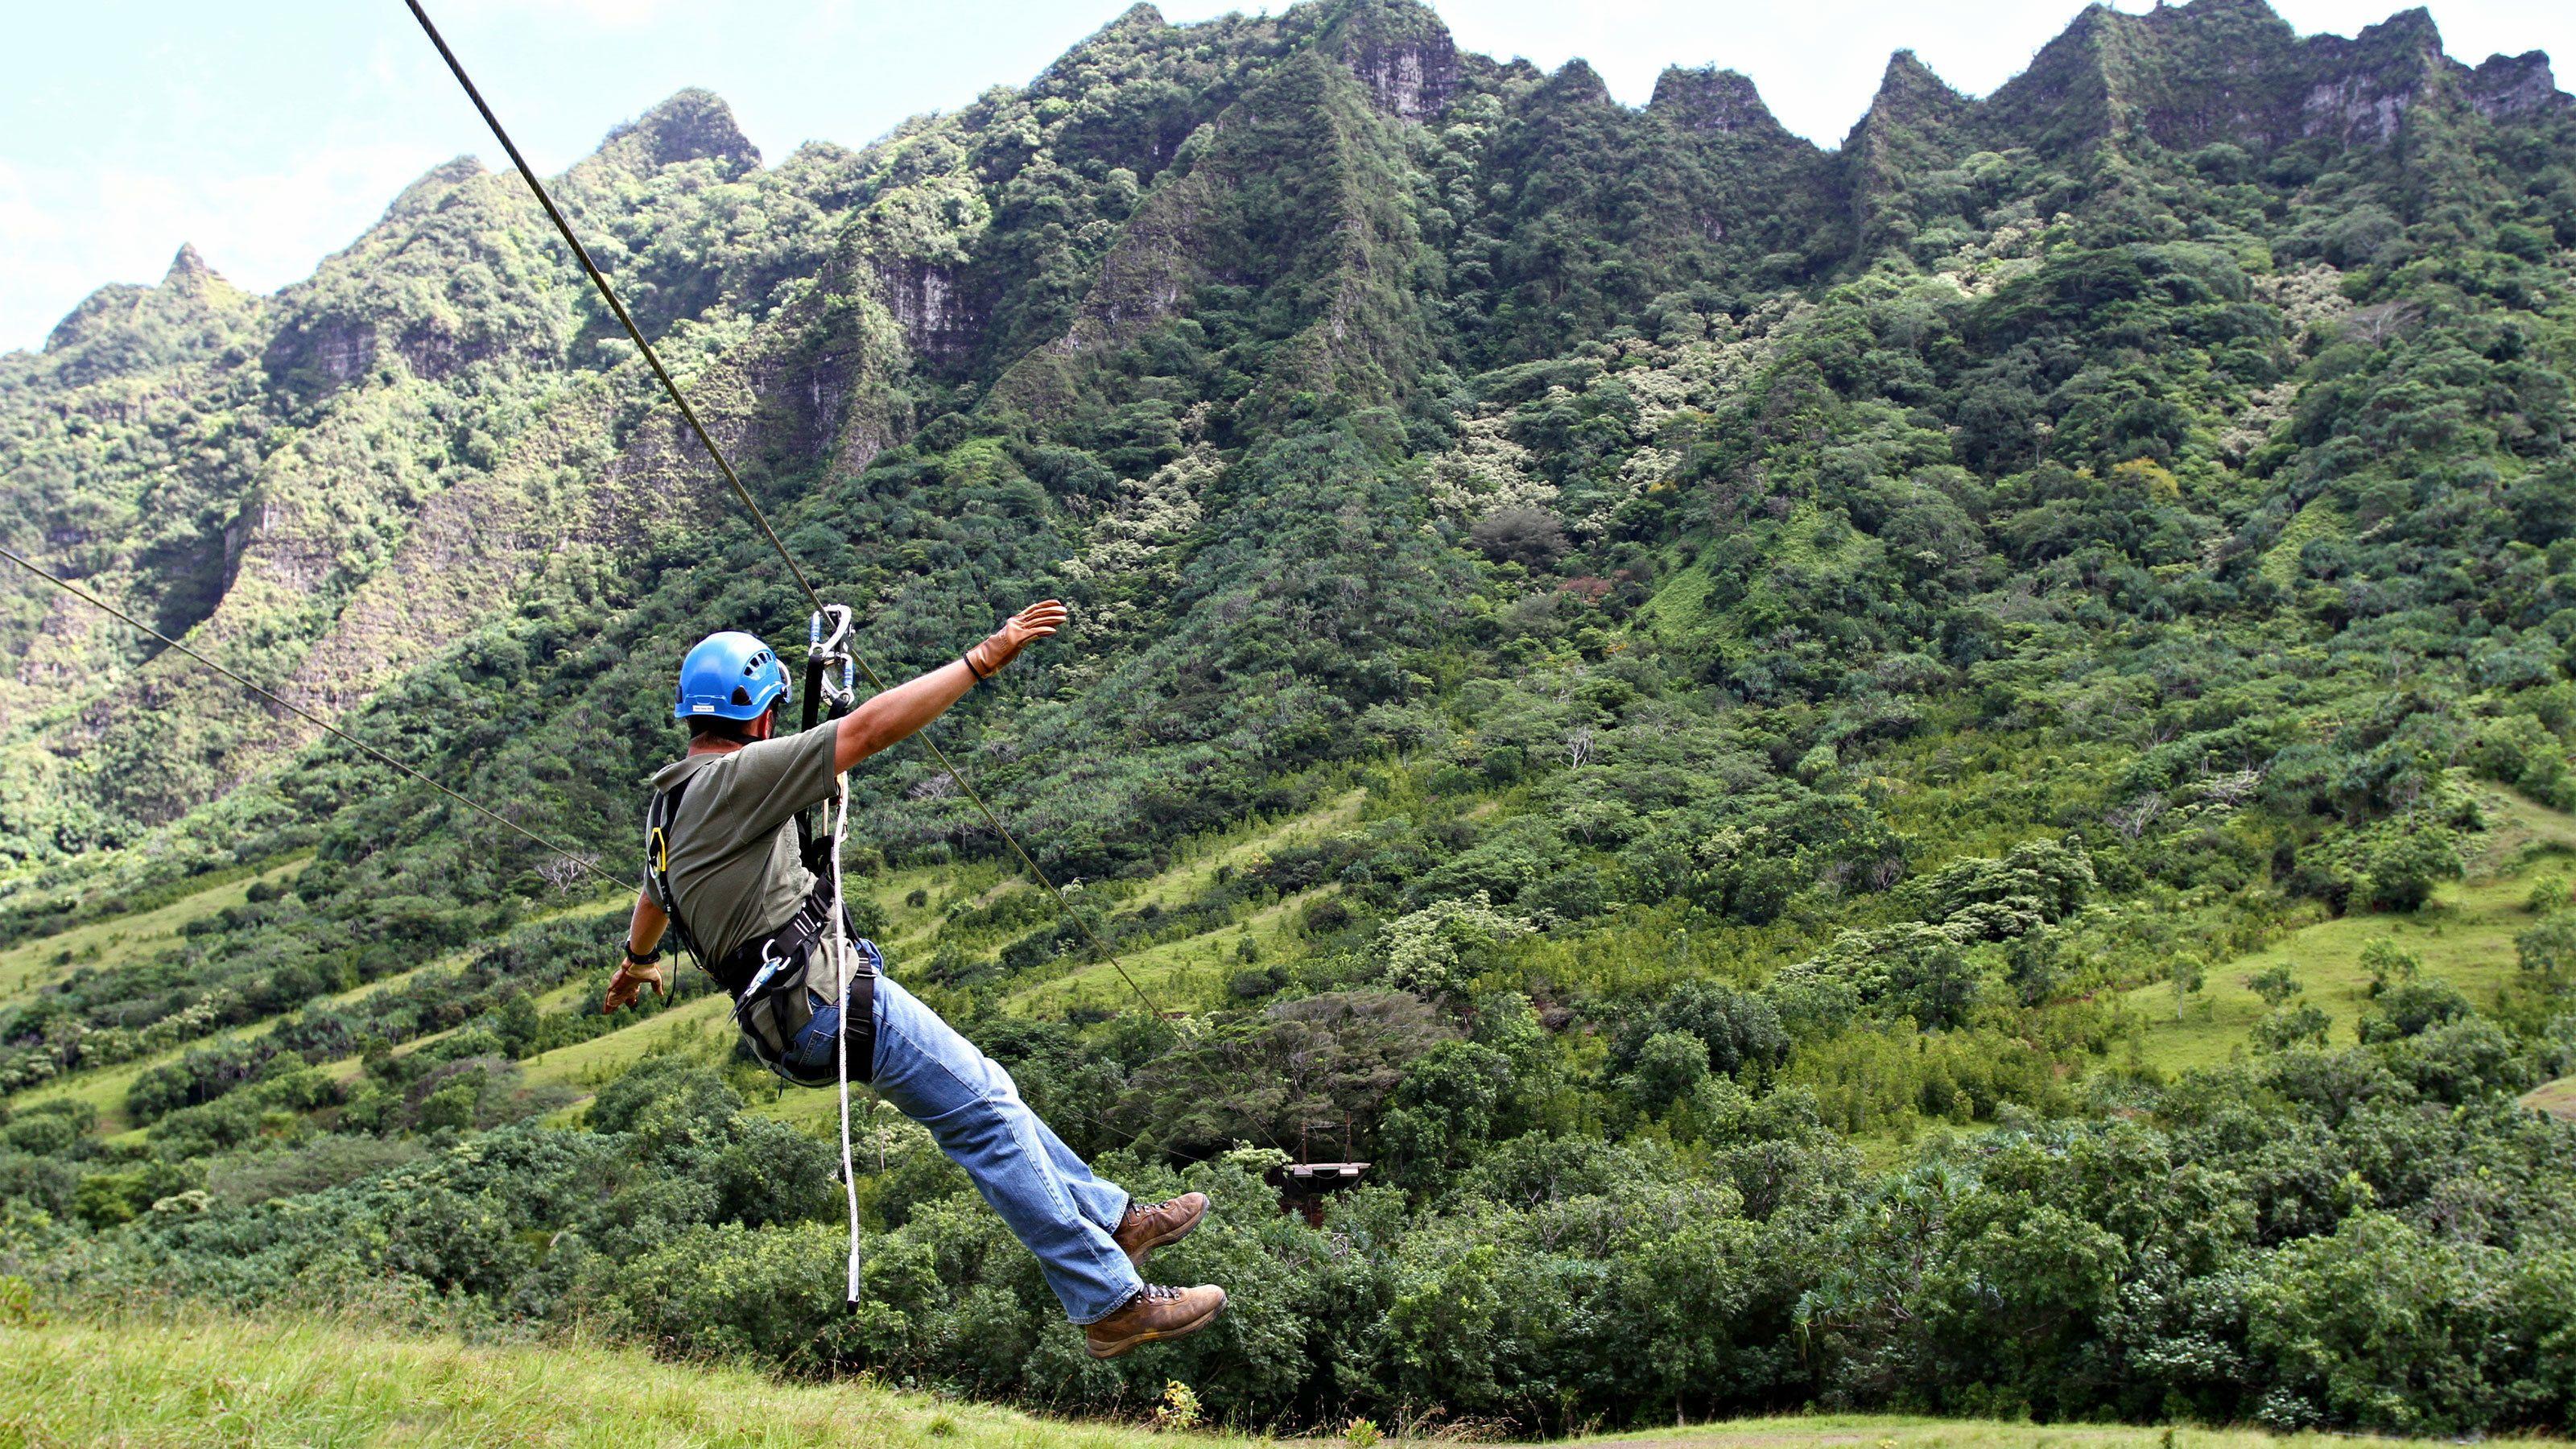 Zipline down the Ka'a'awa Valley from Kualoa Ranch in Oahu